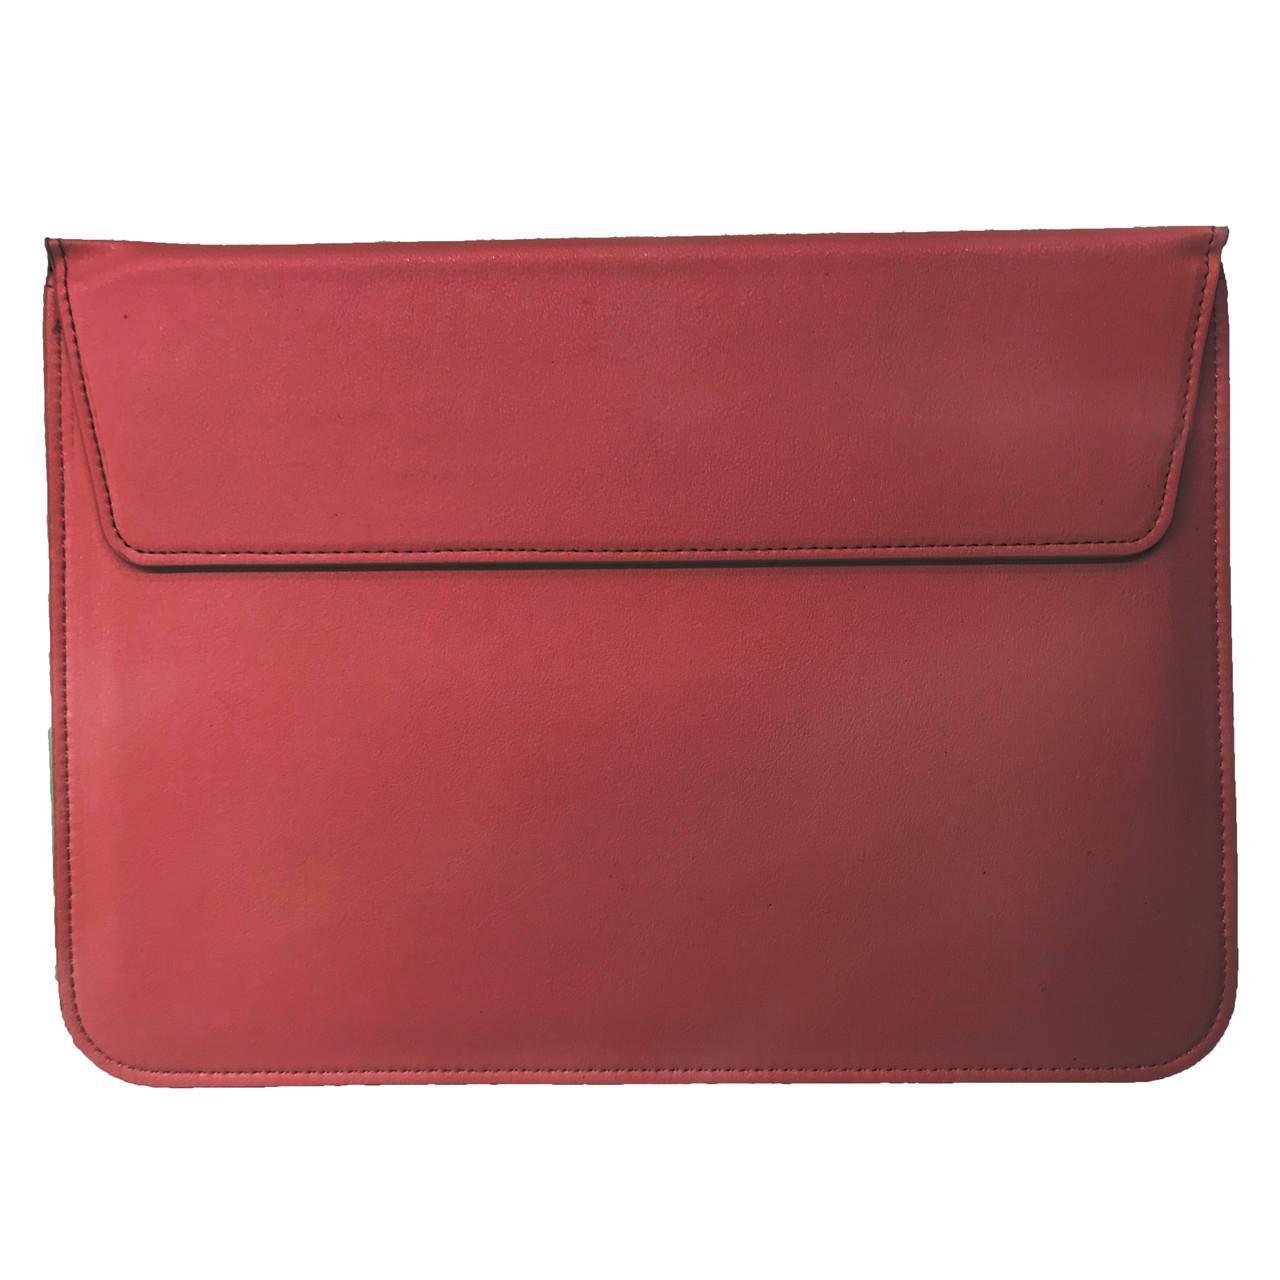 "Папка-конверт PU sleeve bag для MacBook 11"" wine red"